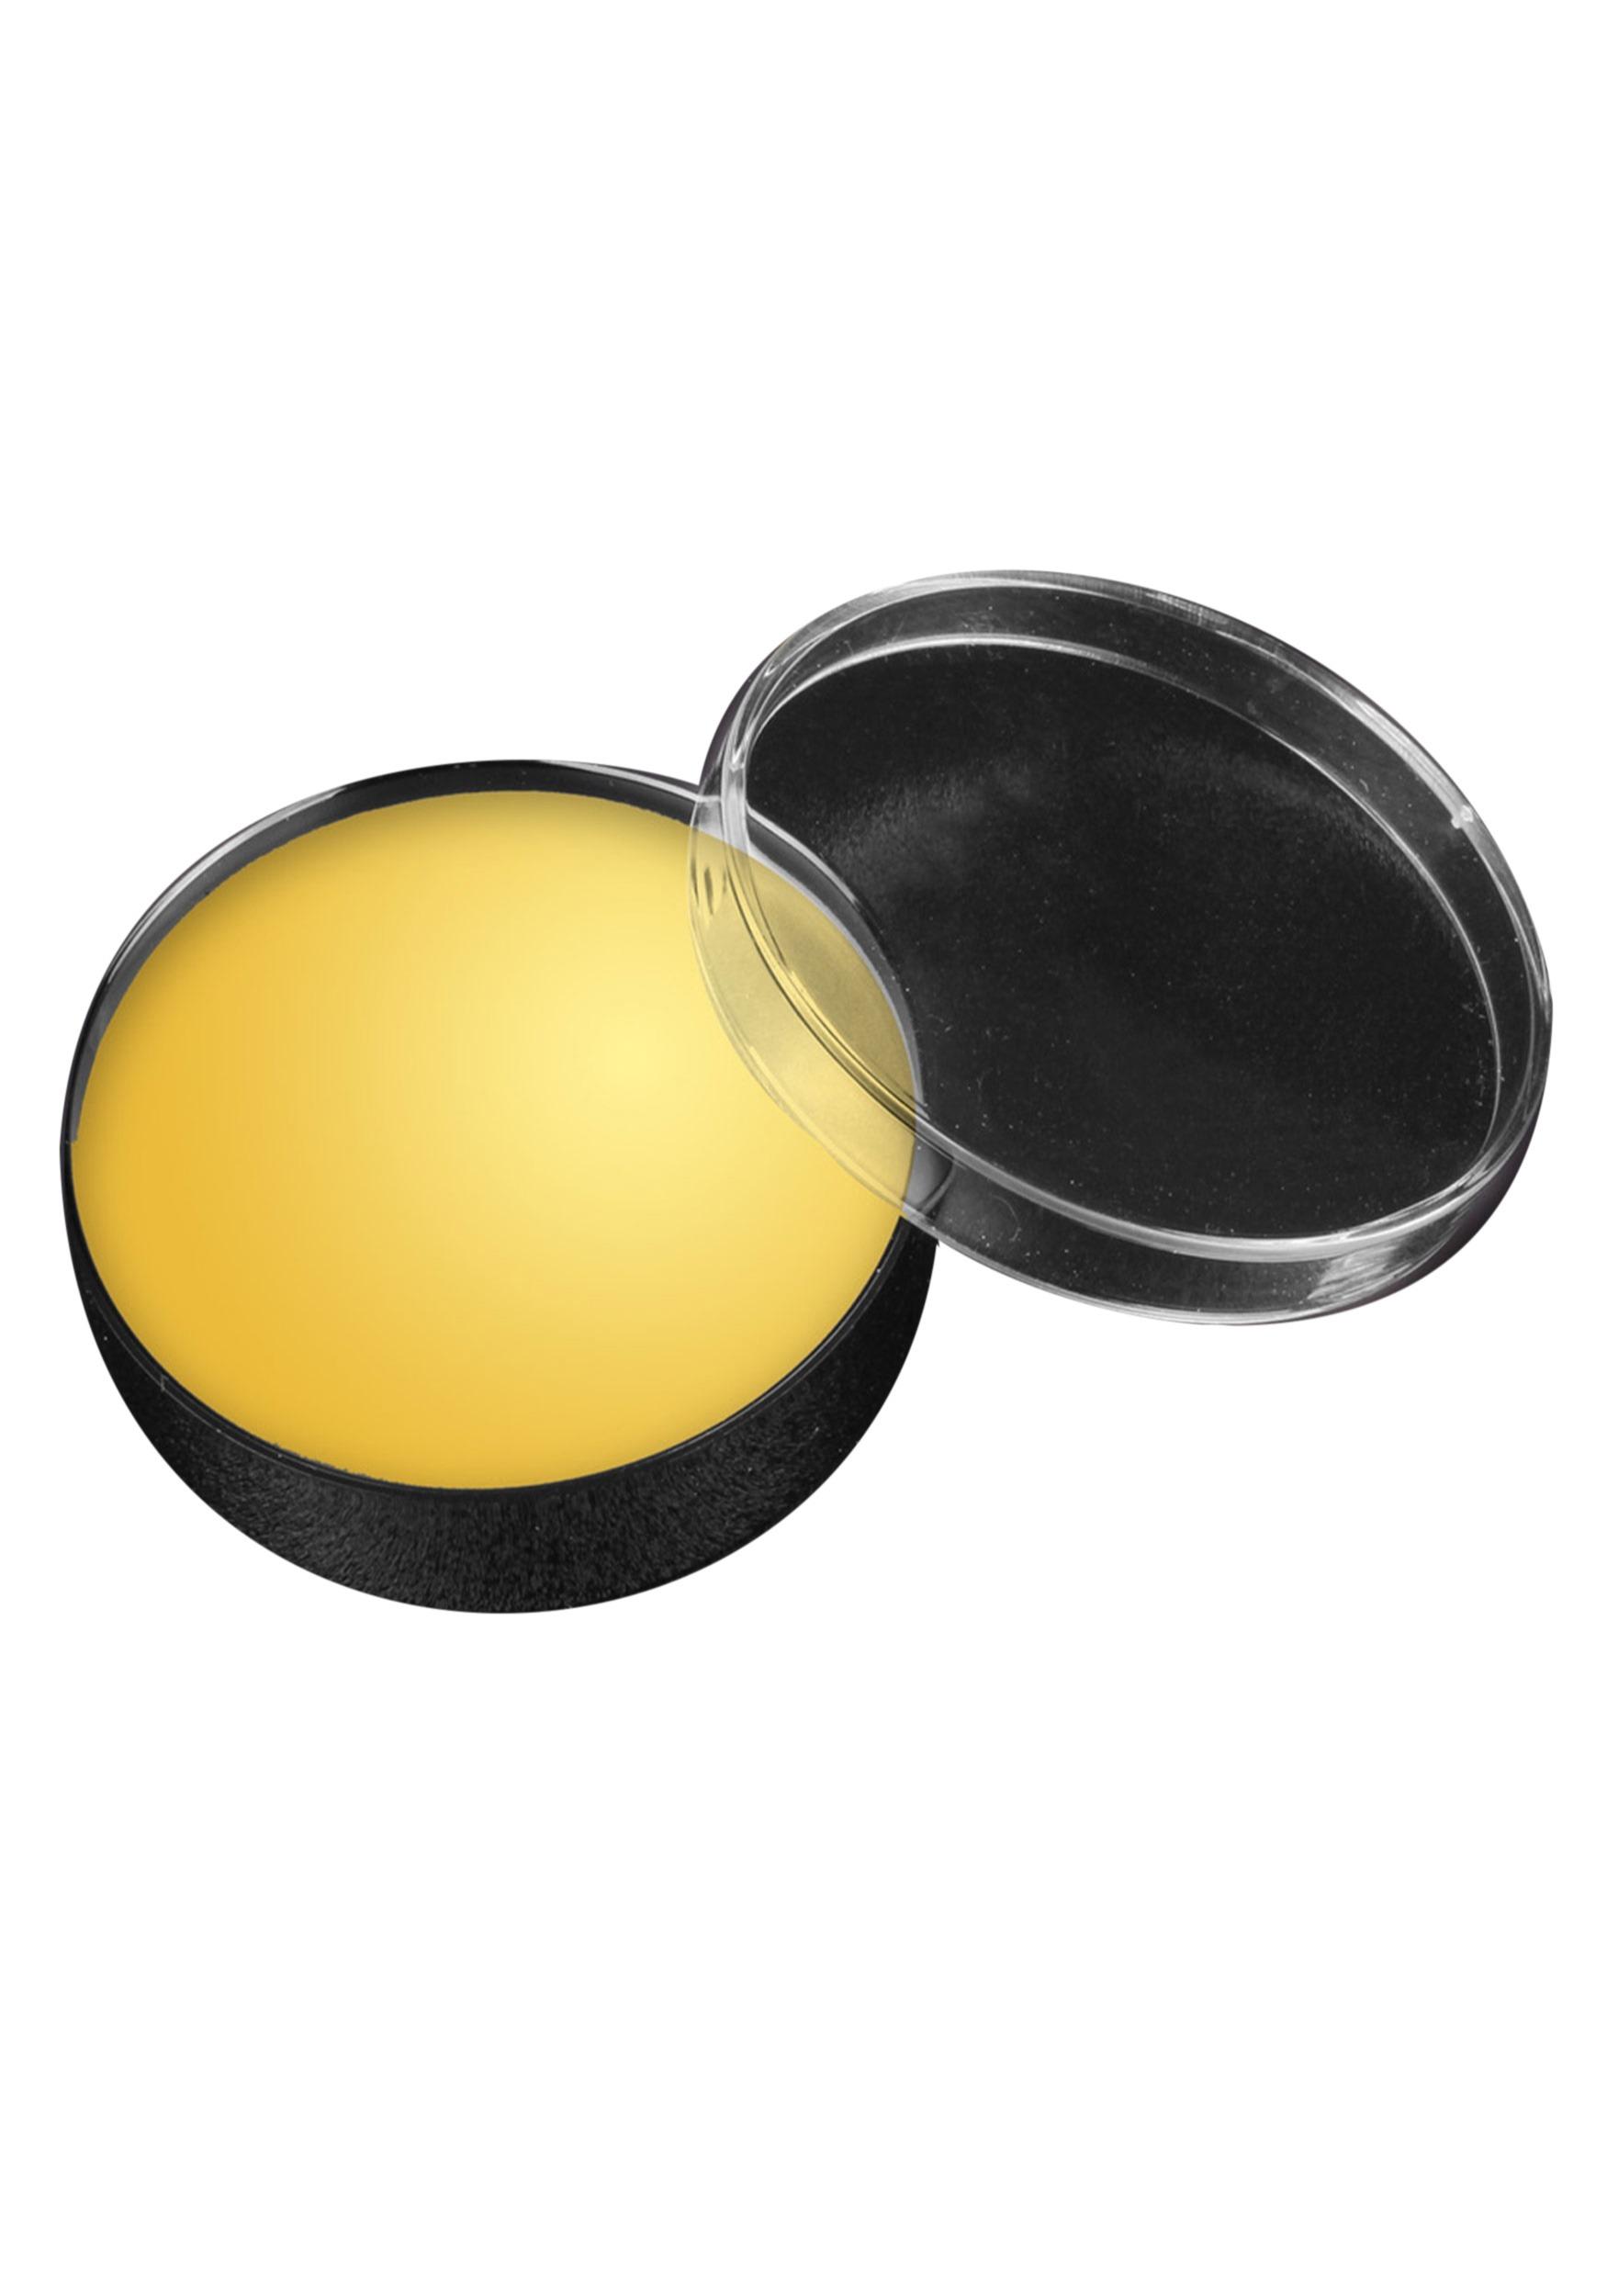 Mehron Gold Premium Greasepaint Makeup 0.5 oz